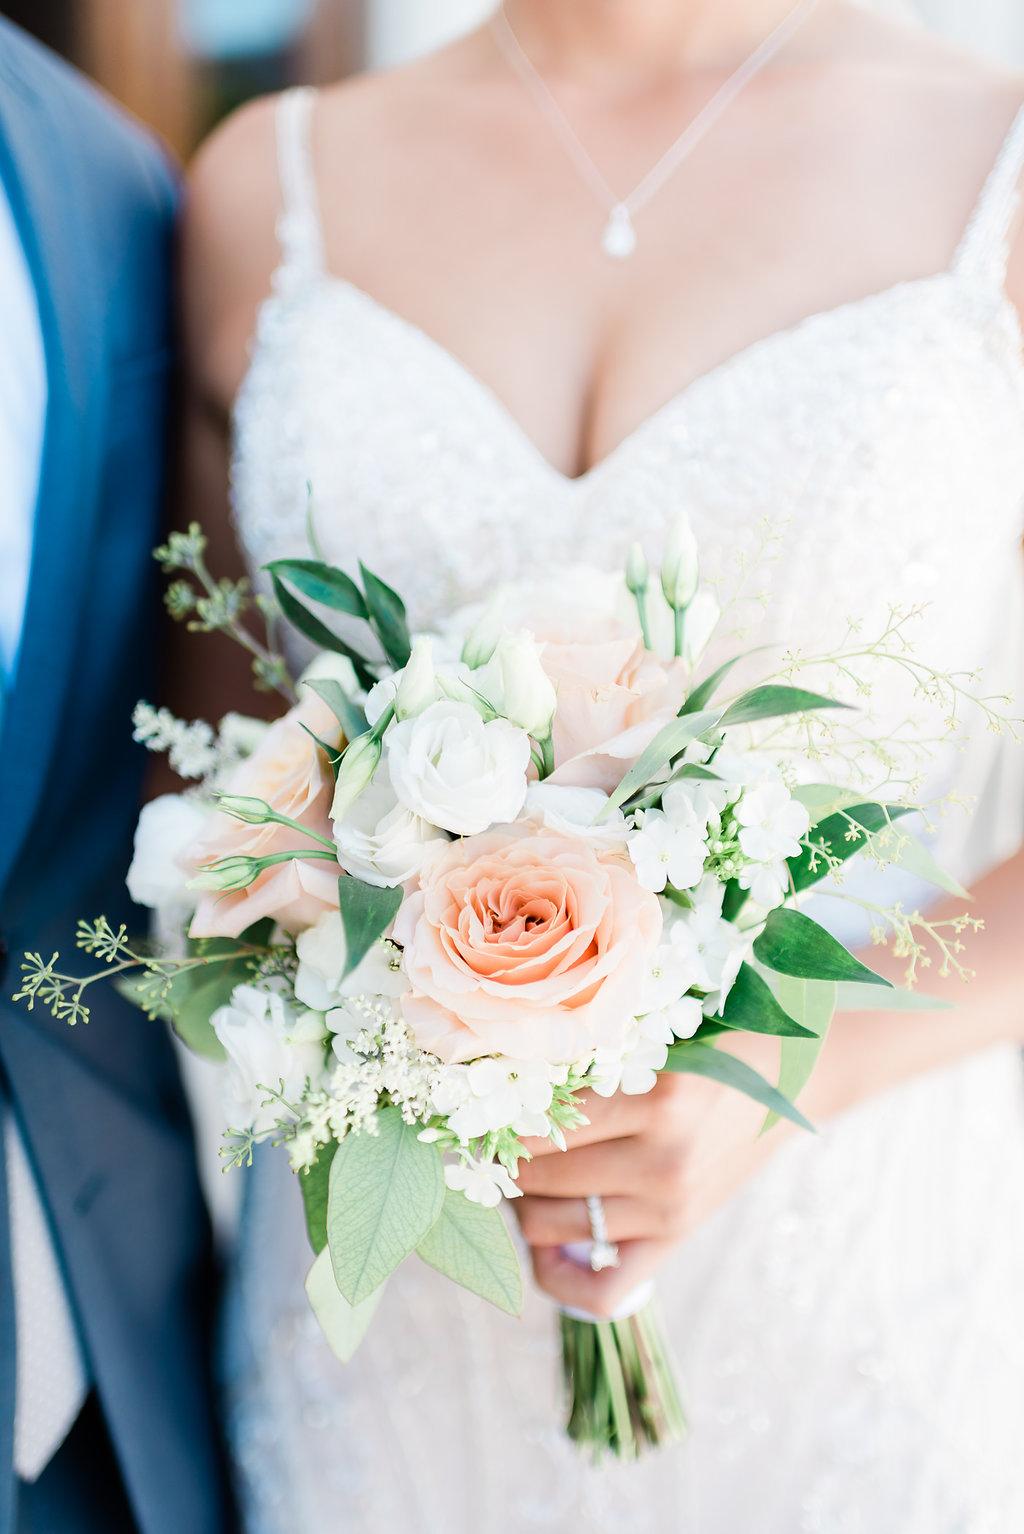 Union-South-Wedding-Photographers-sd-029.jpg